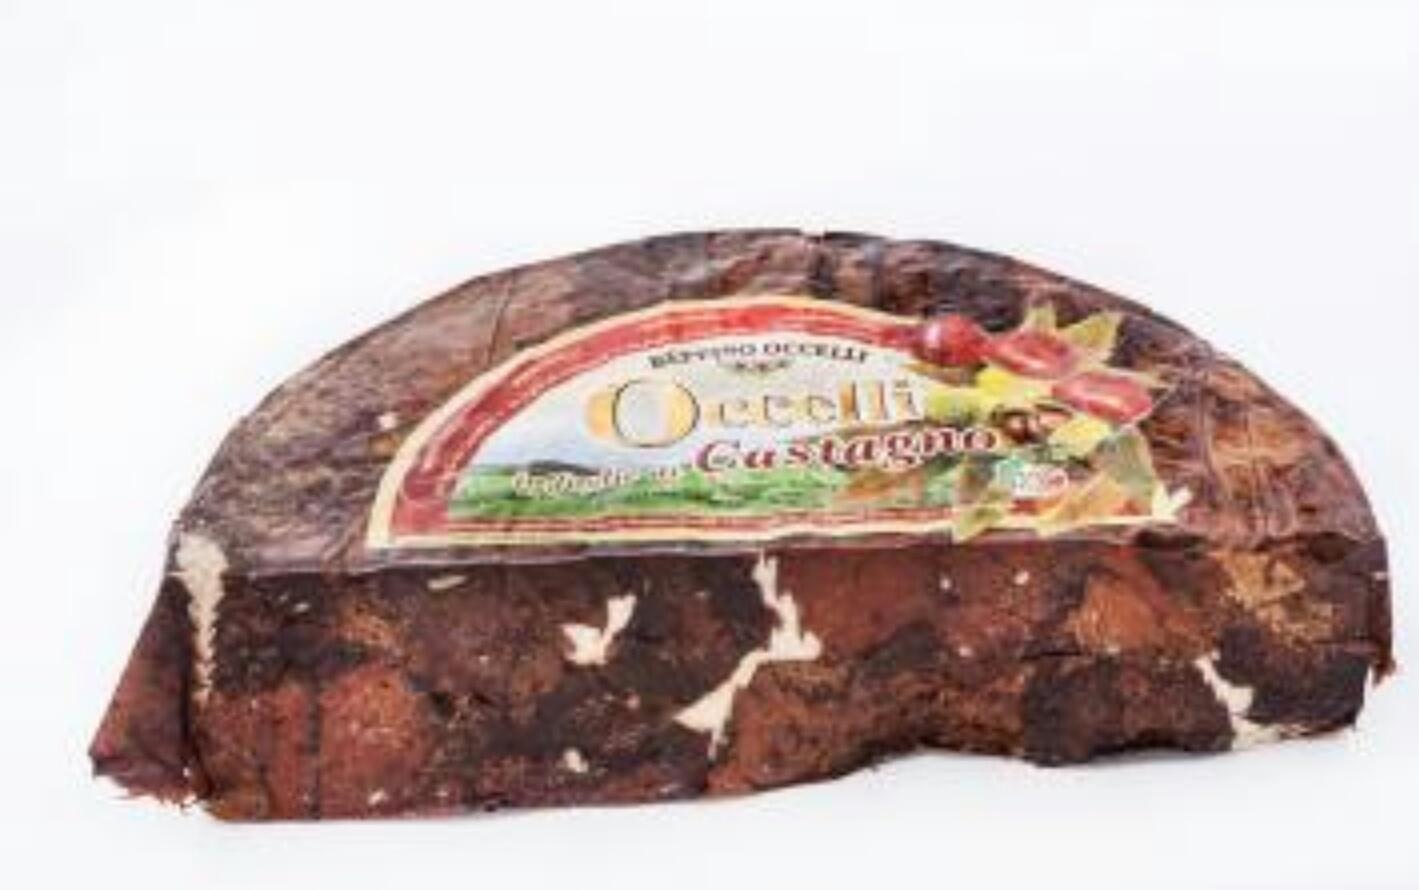 quesos-italianos-productos-gourmet-italianos